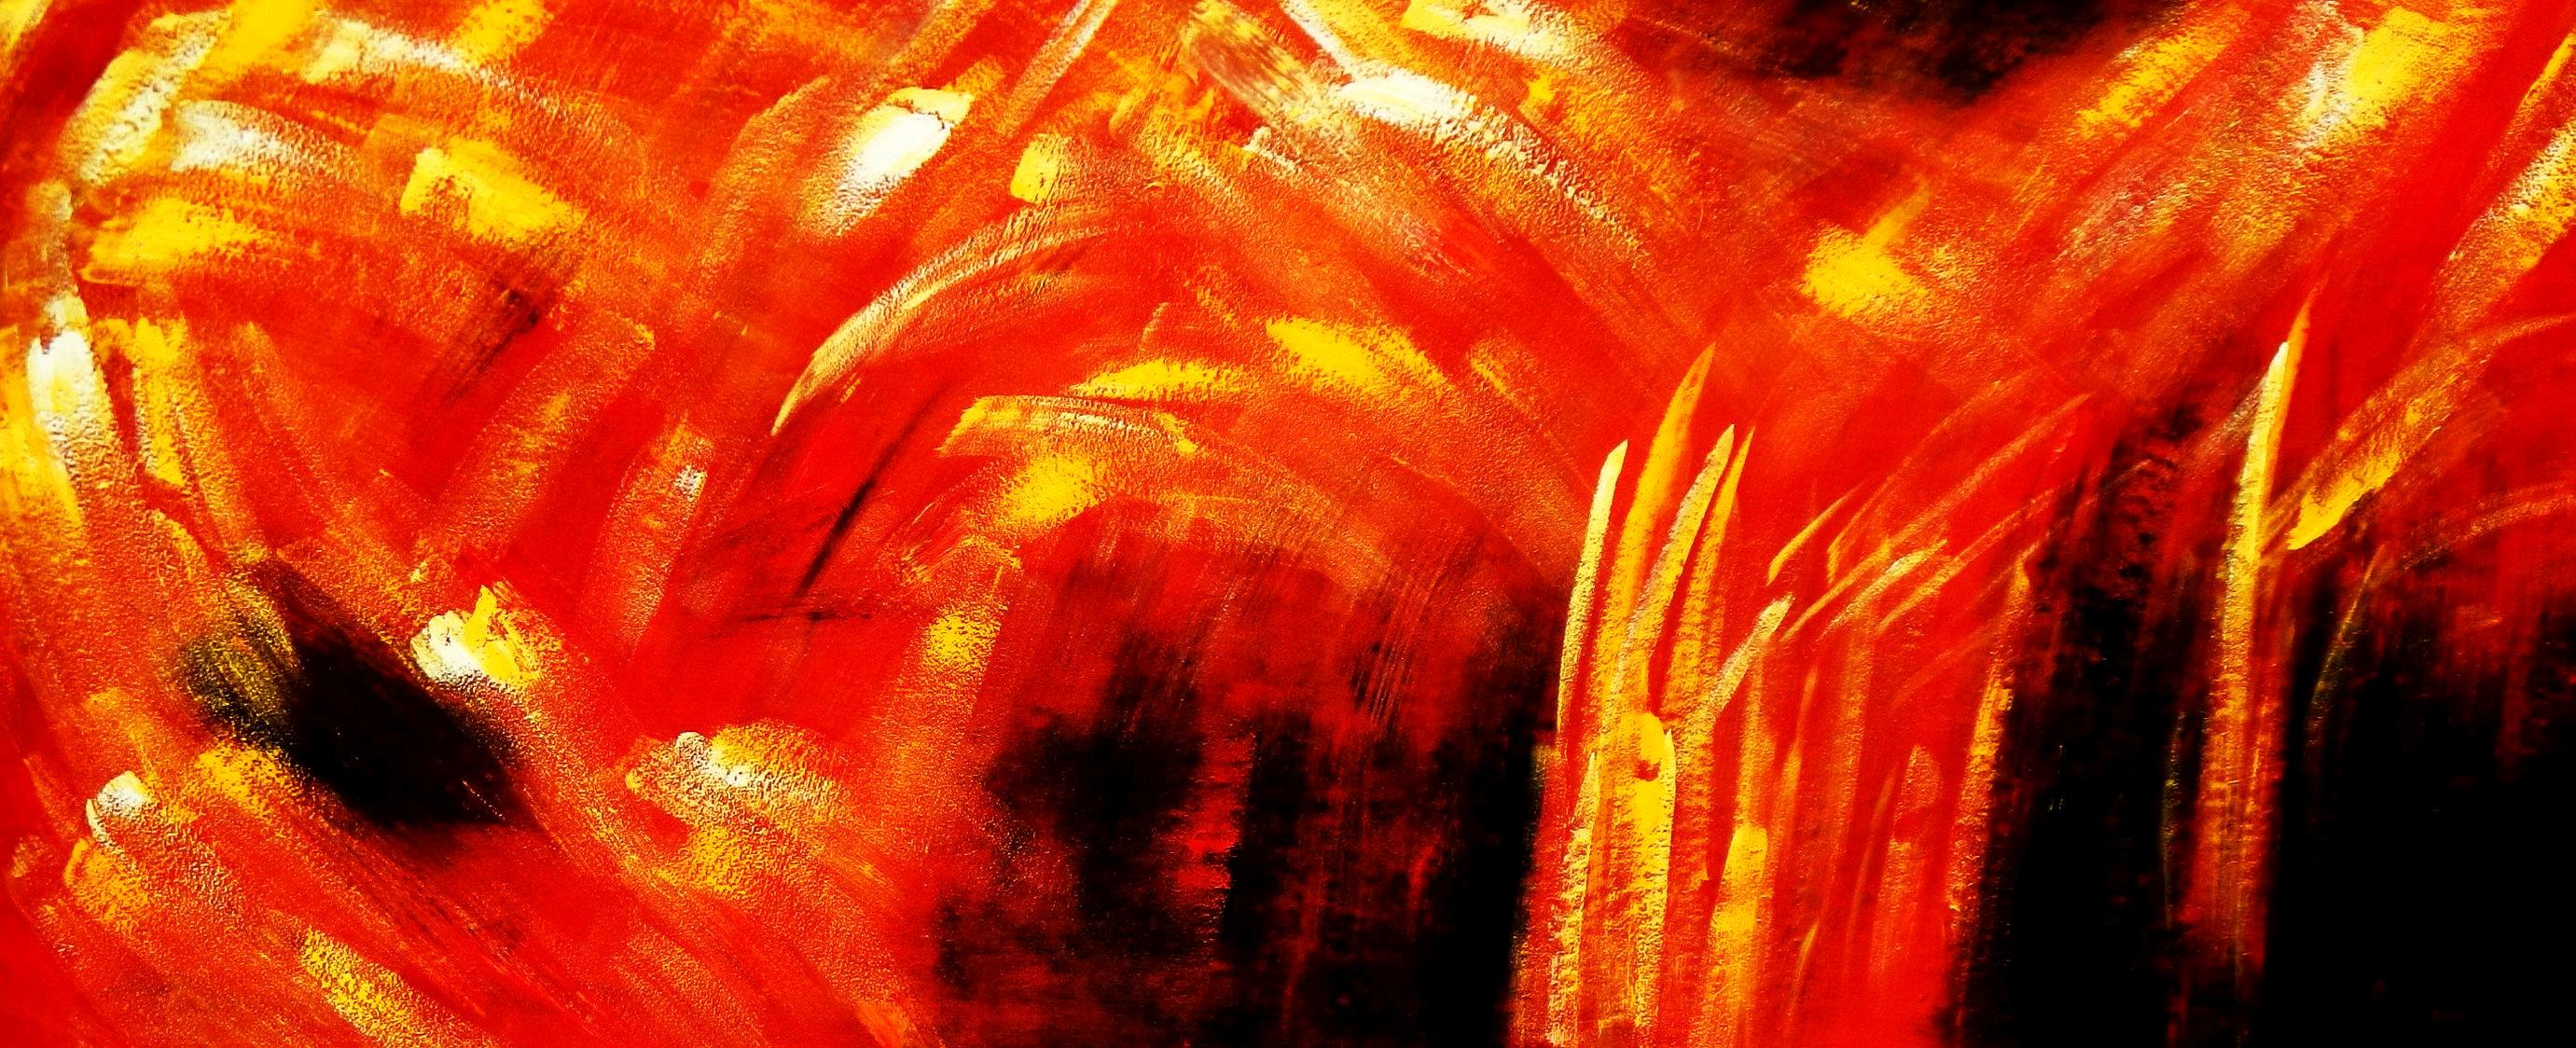 Abstrakt - Der Funkenflug t94491 75x180cm abstraktes Ölbid handgemalt